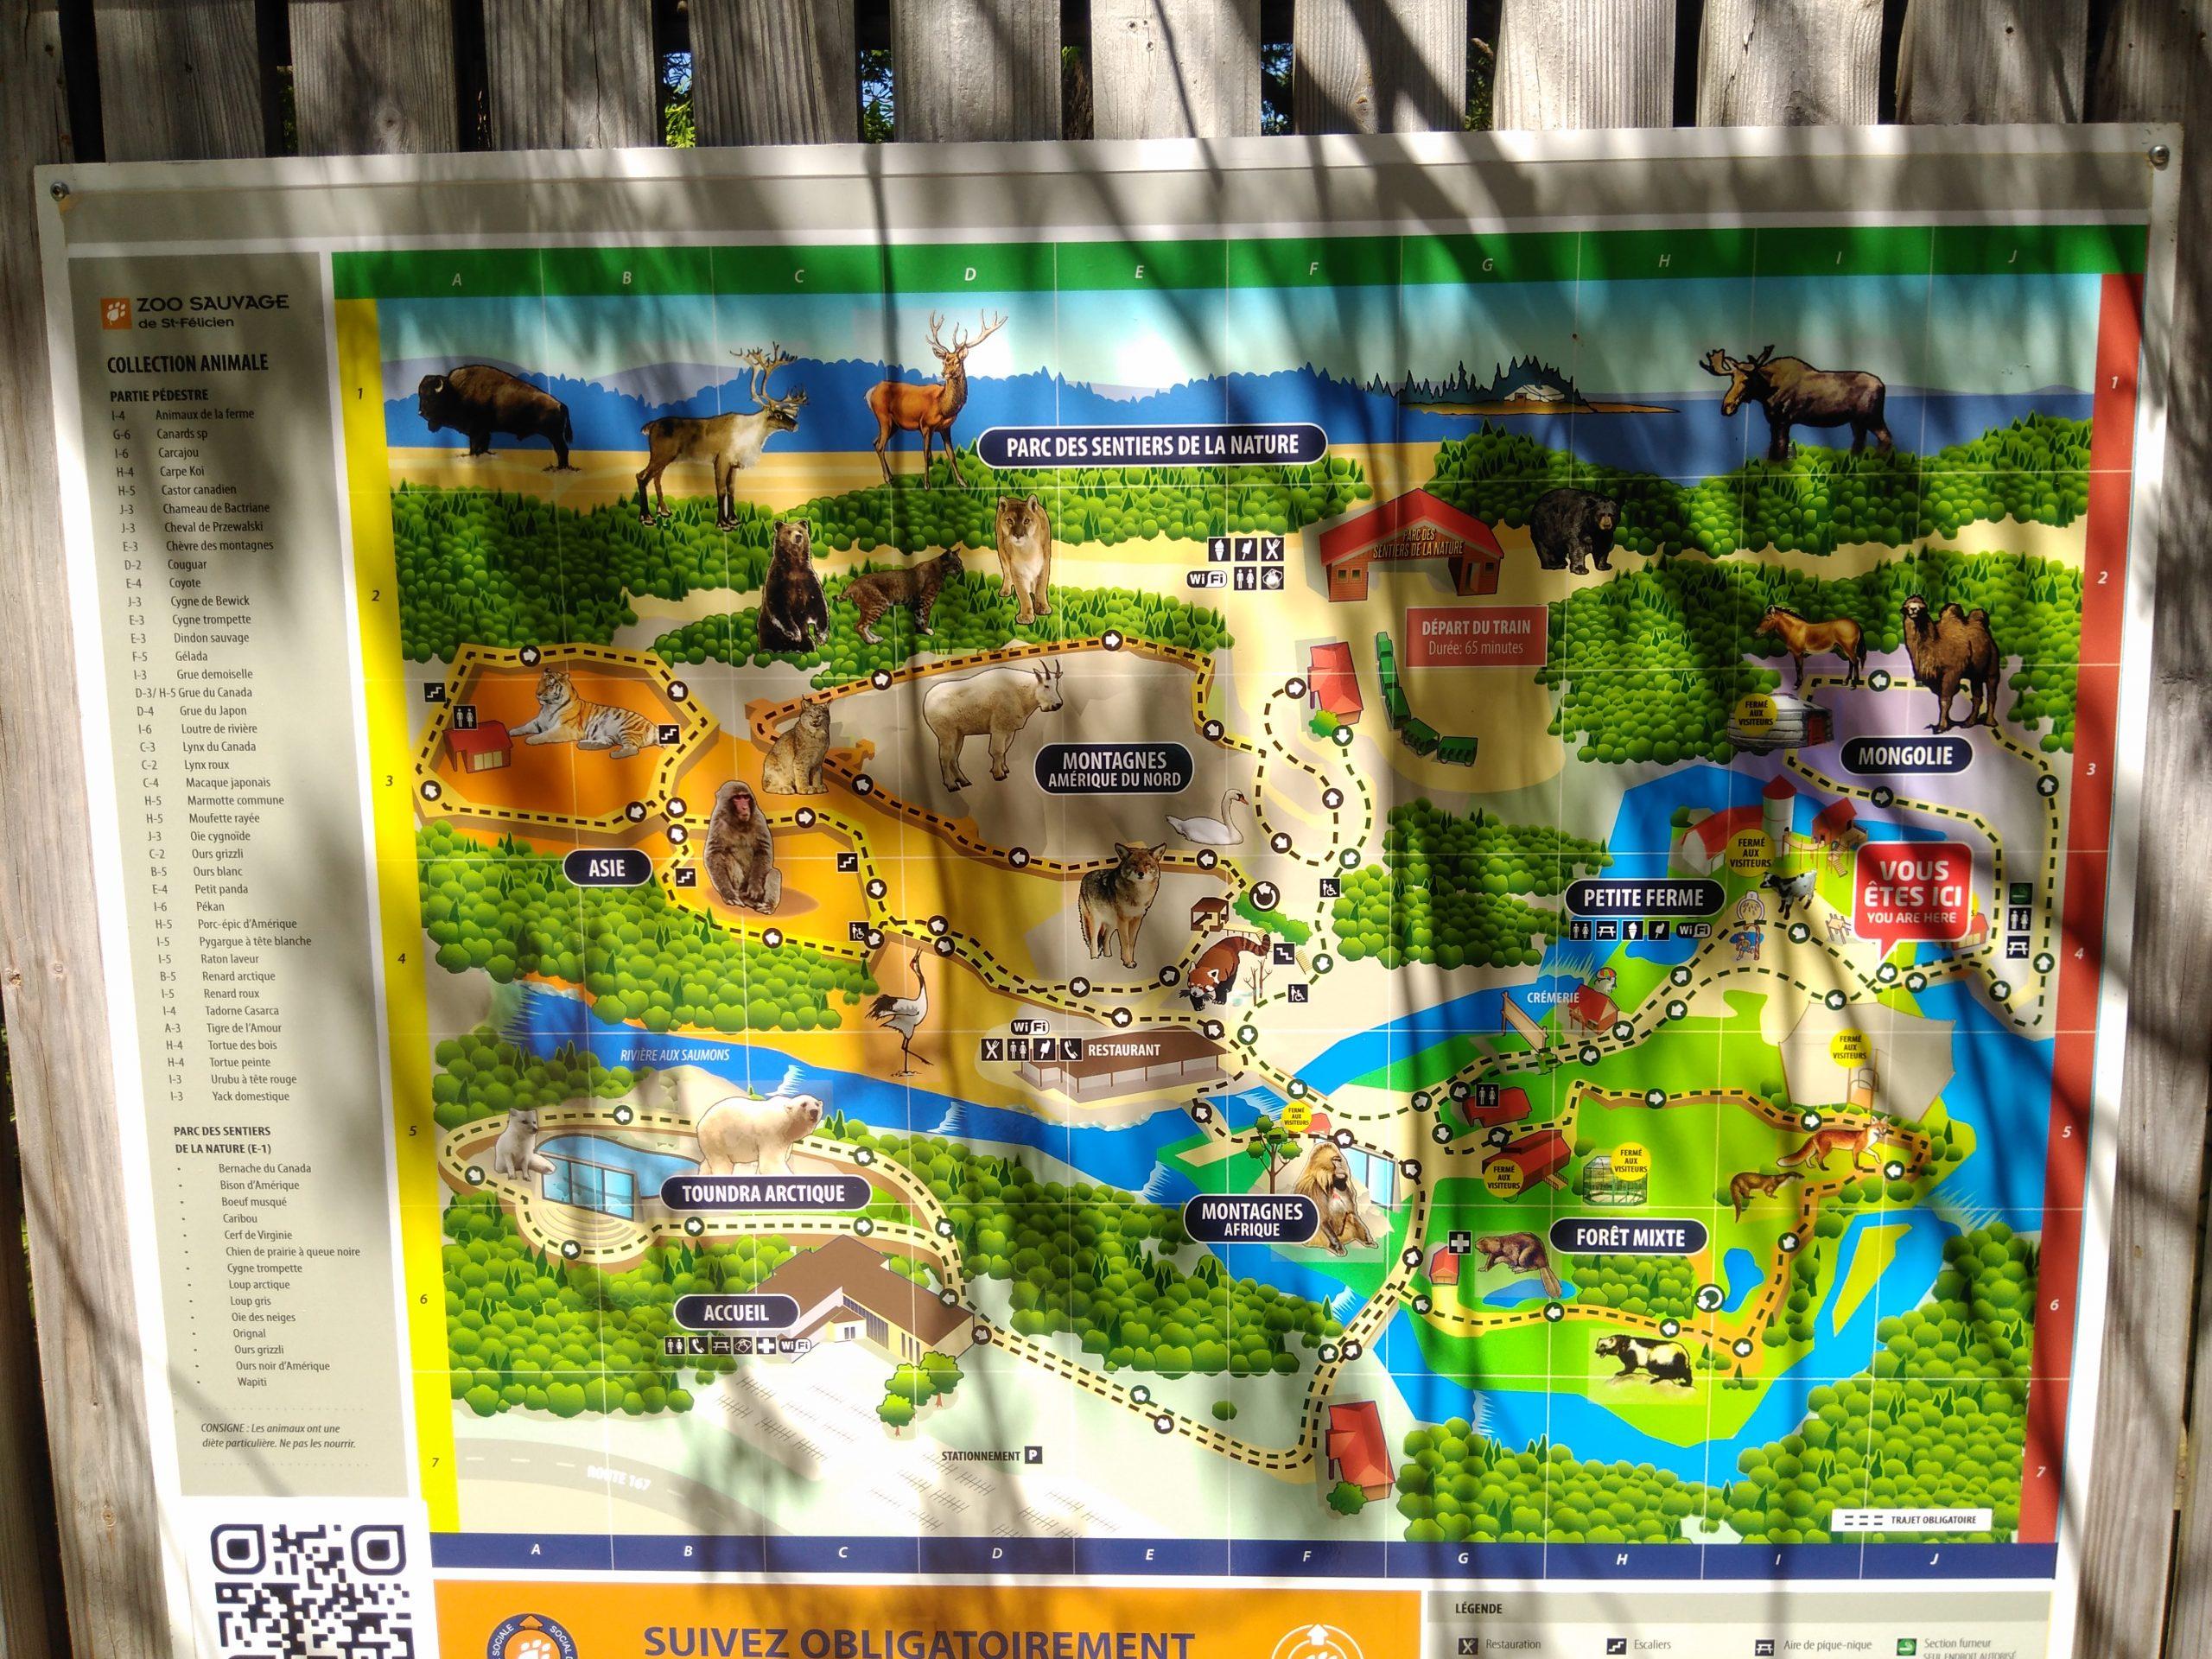 Carte zoo sauvage st-félicien